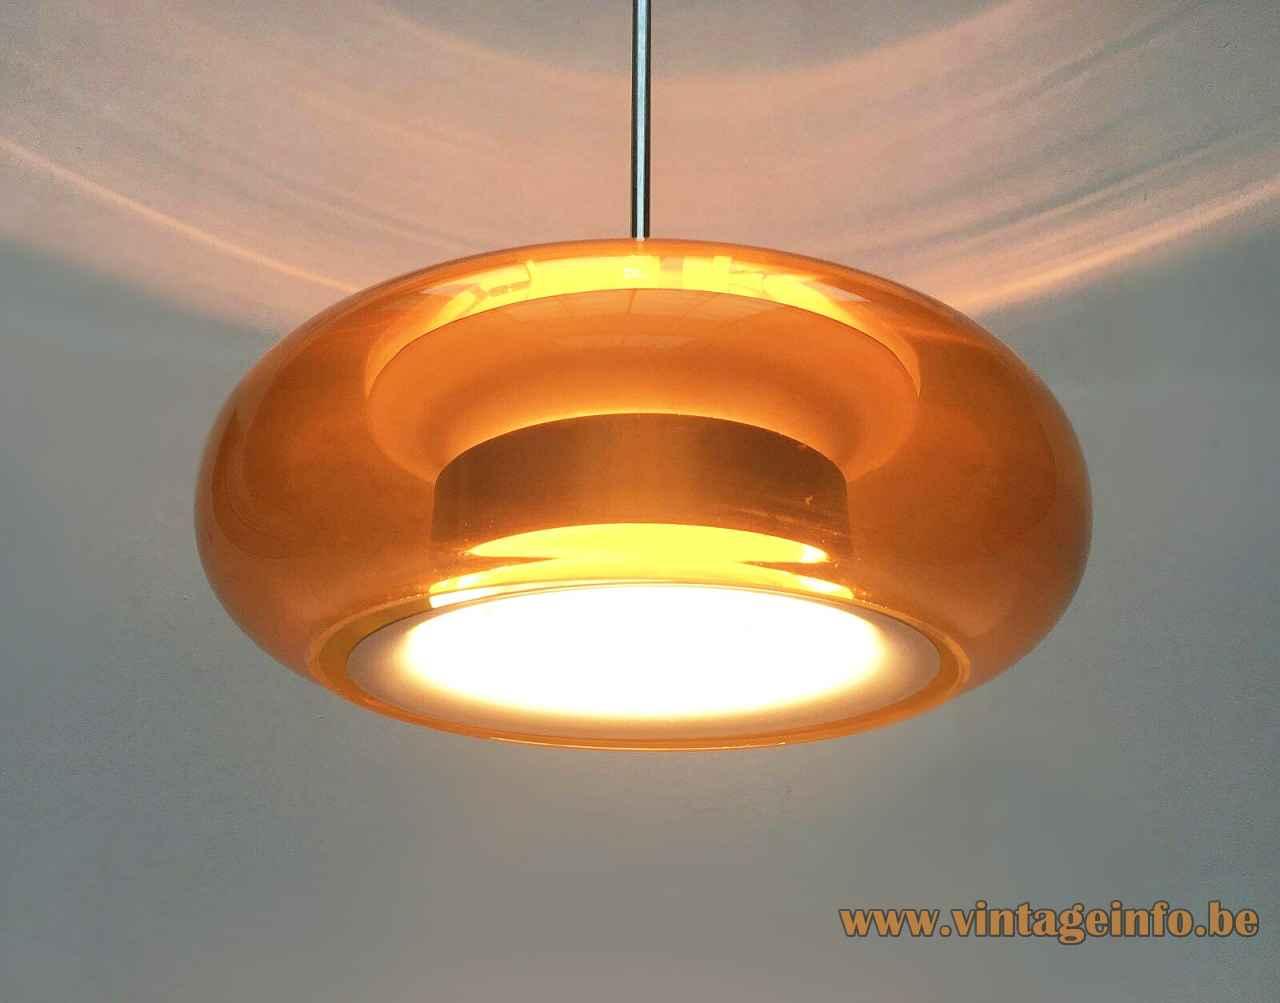 DORIA doughnut pendant lamp round clear orange glass lampshade aluminium diffuser 1960s 1970s Germany E27 socket